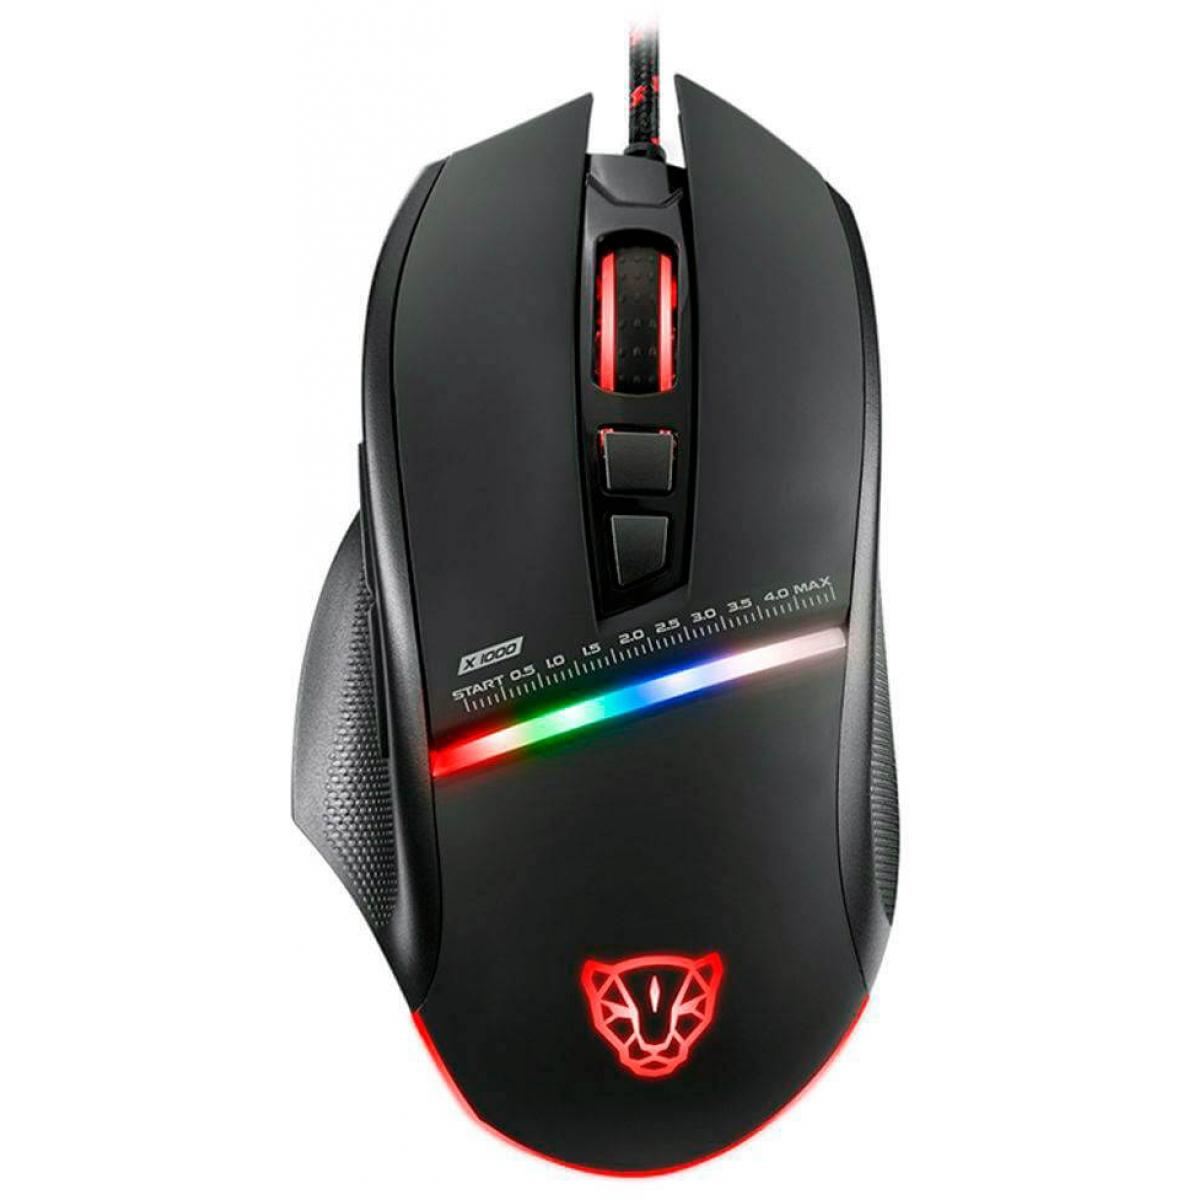 Mouse Gamer Motospeed V10 RGB, 4000 DPI, Black, FMSMS0001PTO